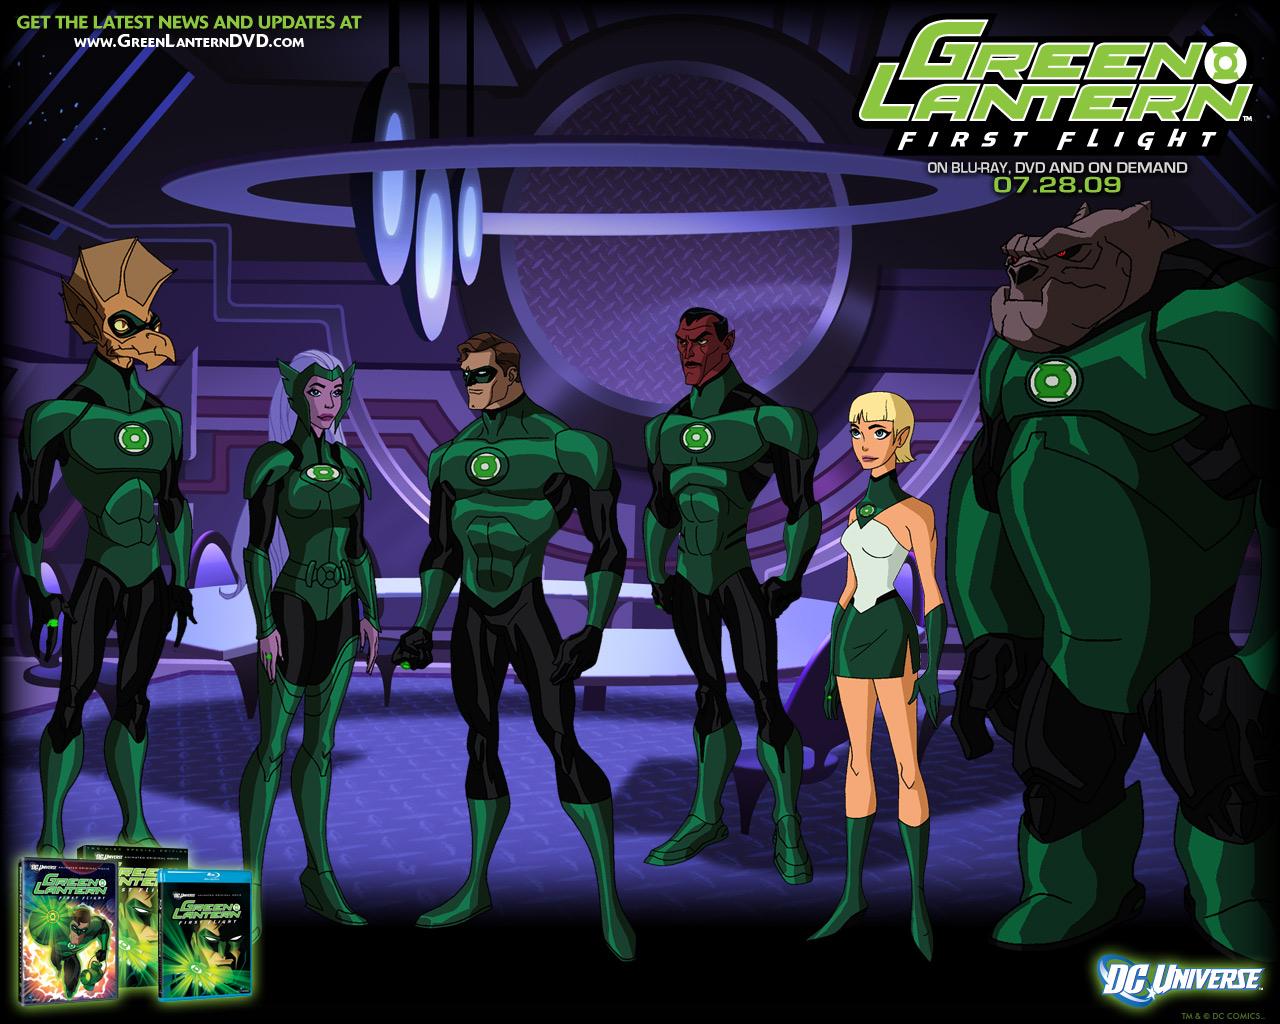 Green Lantern First Flight wallpapers Movie HQ Green Lantern 1280x1024